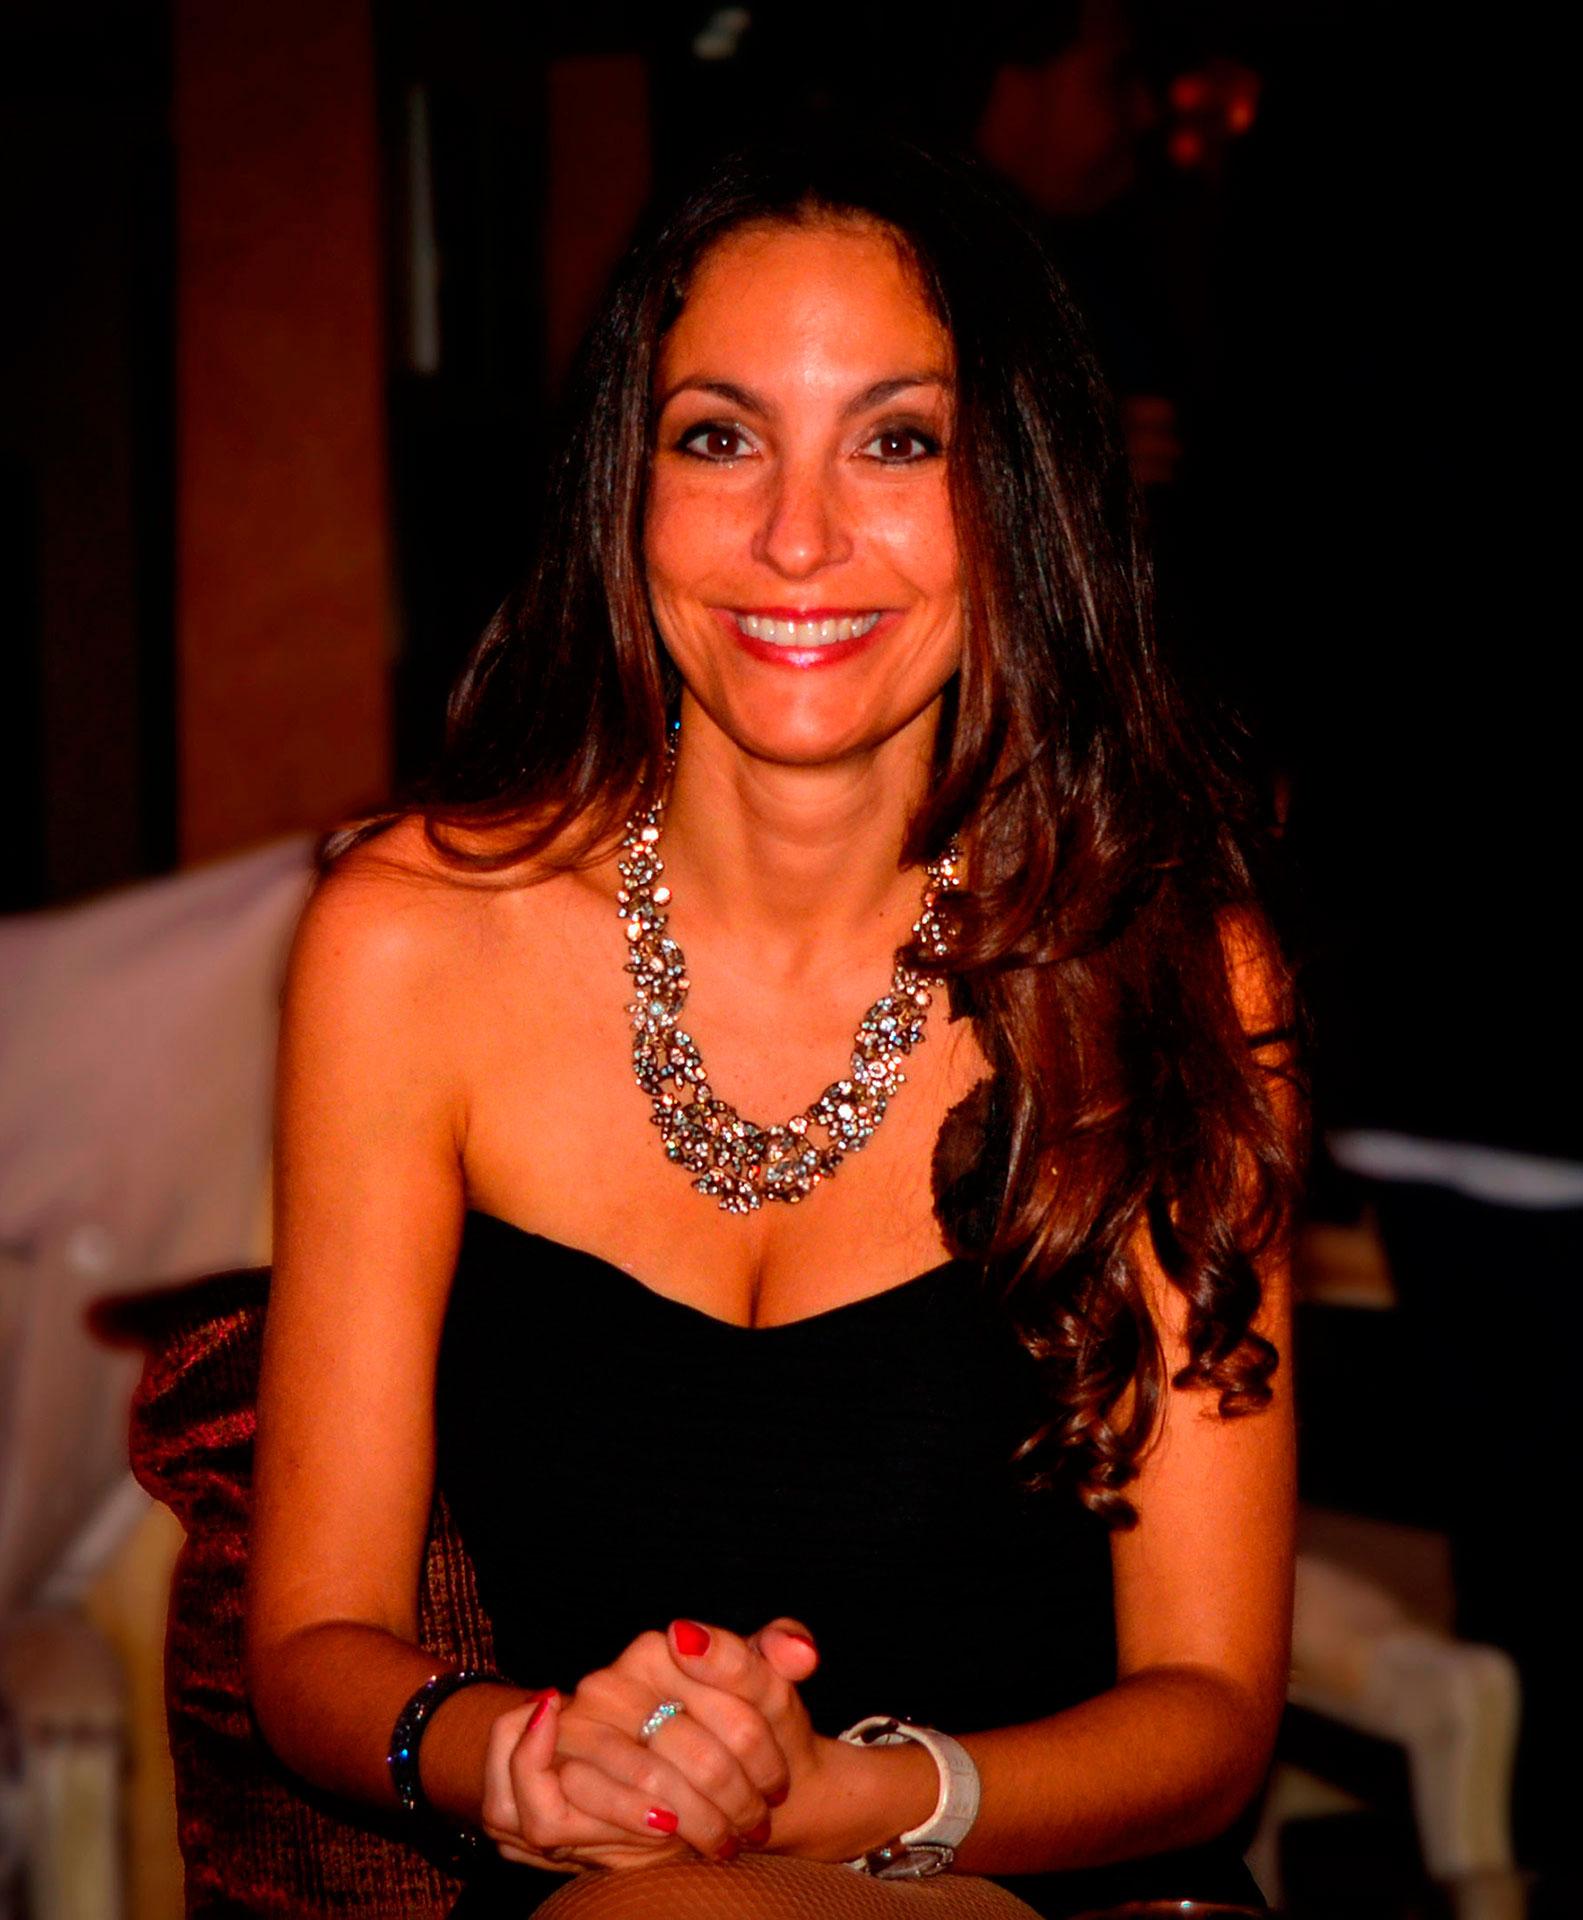 Ariana's Birthday Party at Finca Besaya - Marbella - www.arianasoffici.com